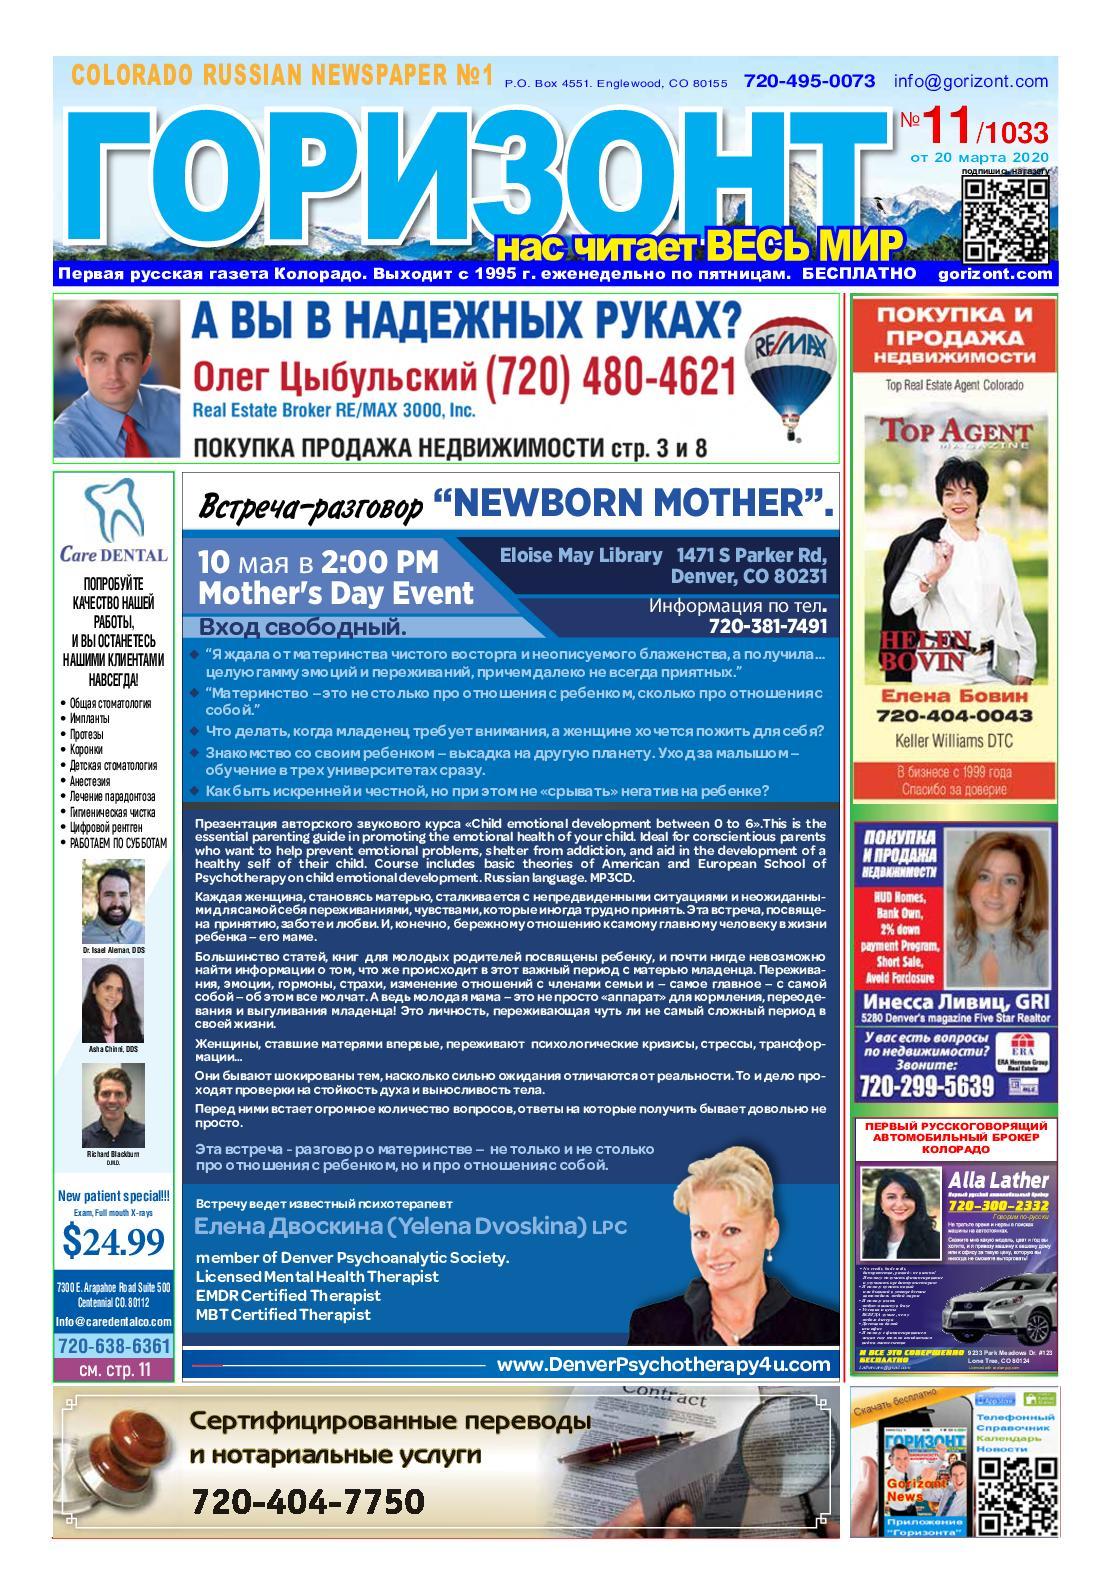 Горизонт 02/1023 by Gorizont Russian Newspaper - issuu | 1590x1113